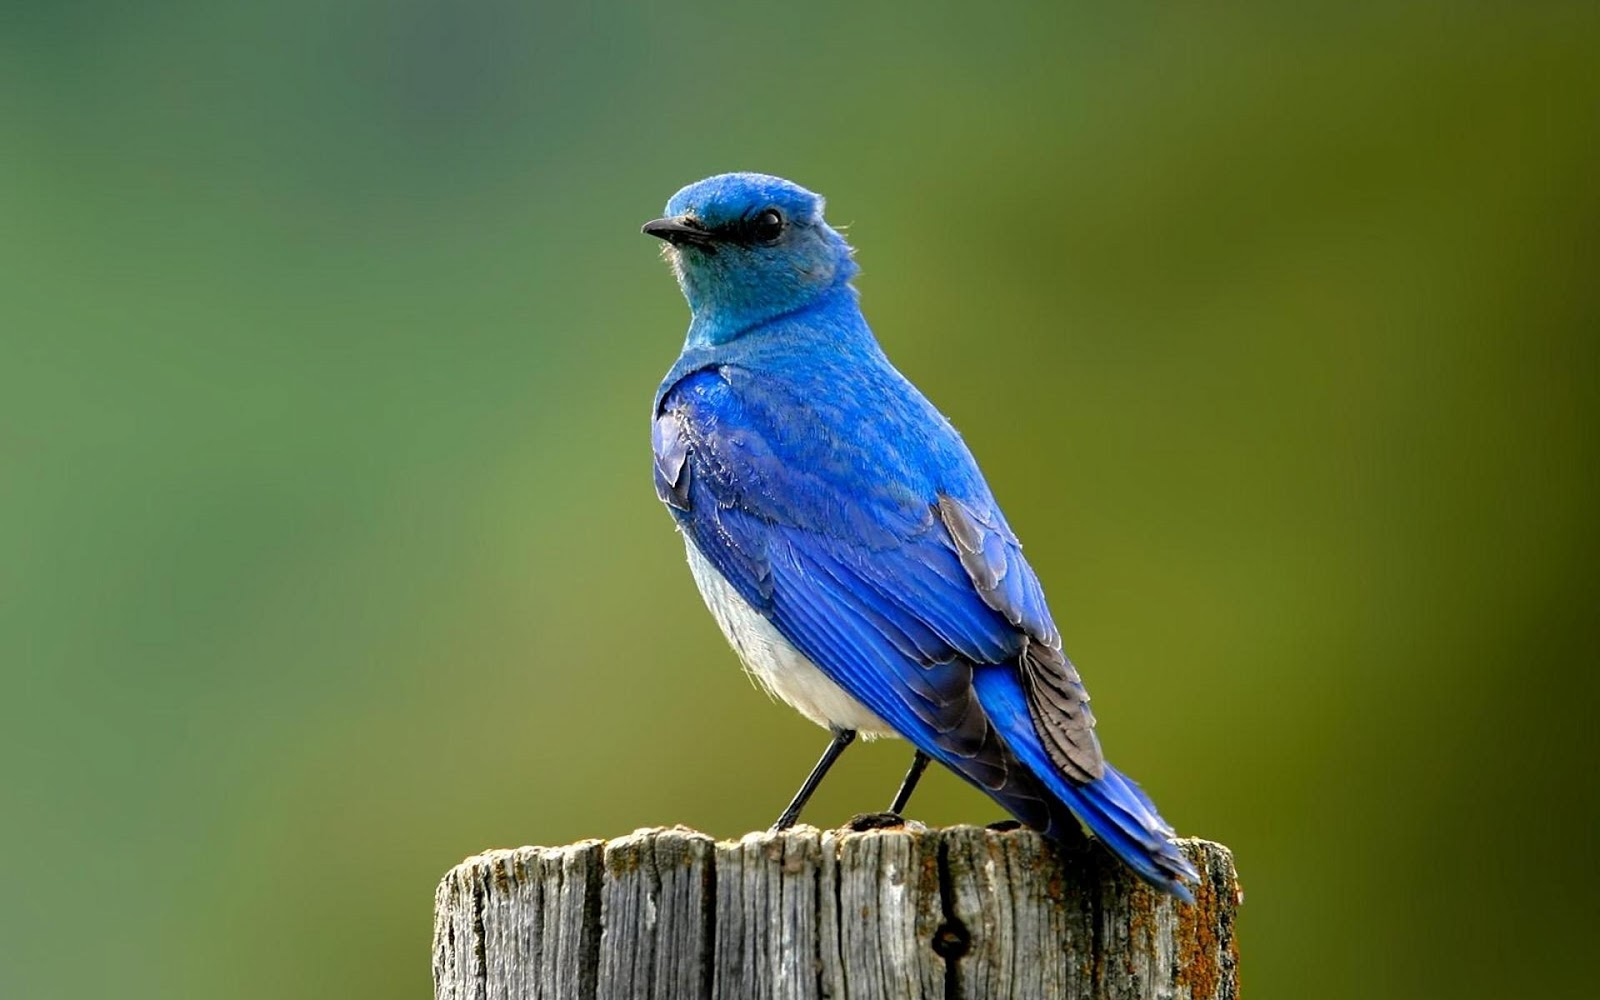 blue bird wallpaper blue bird wallpapers bird wallpaper hd beautiful 1600x1000